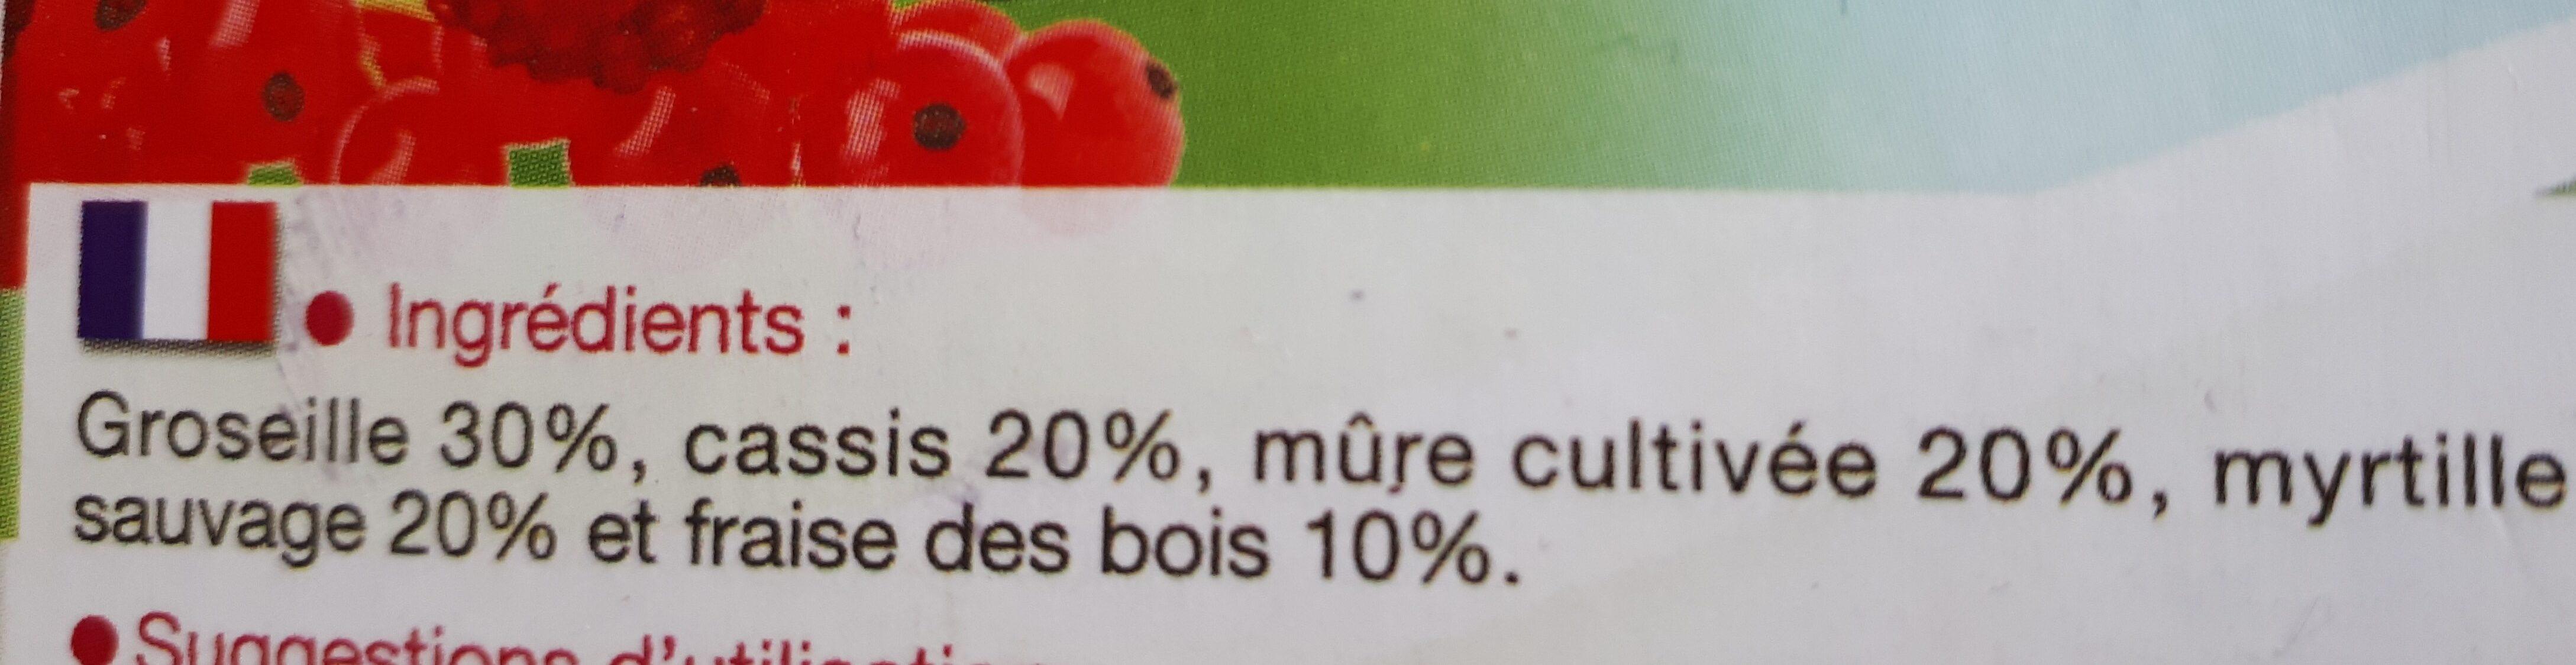 Cockt.fruits Rouges 600G, - Ingrédients